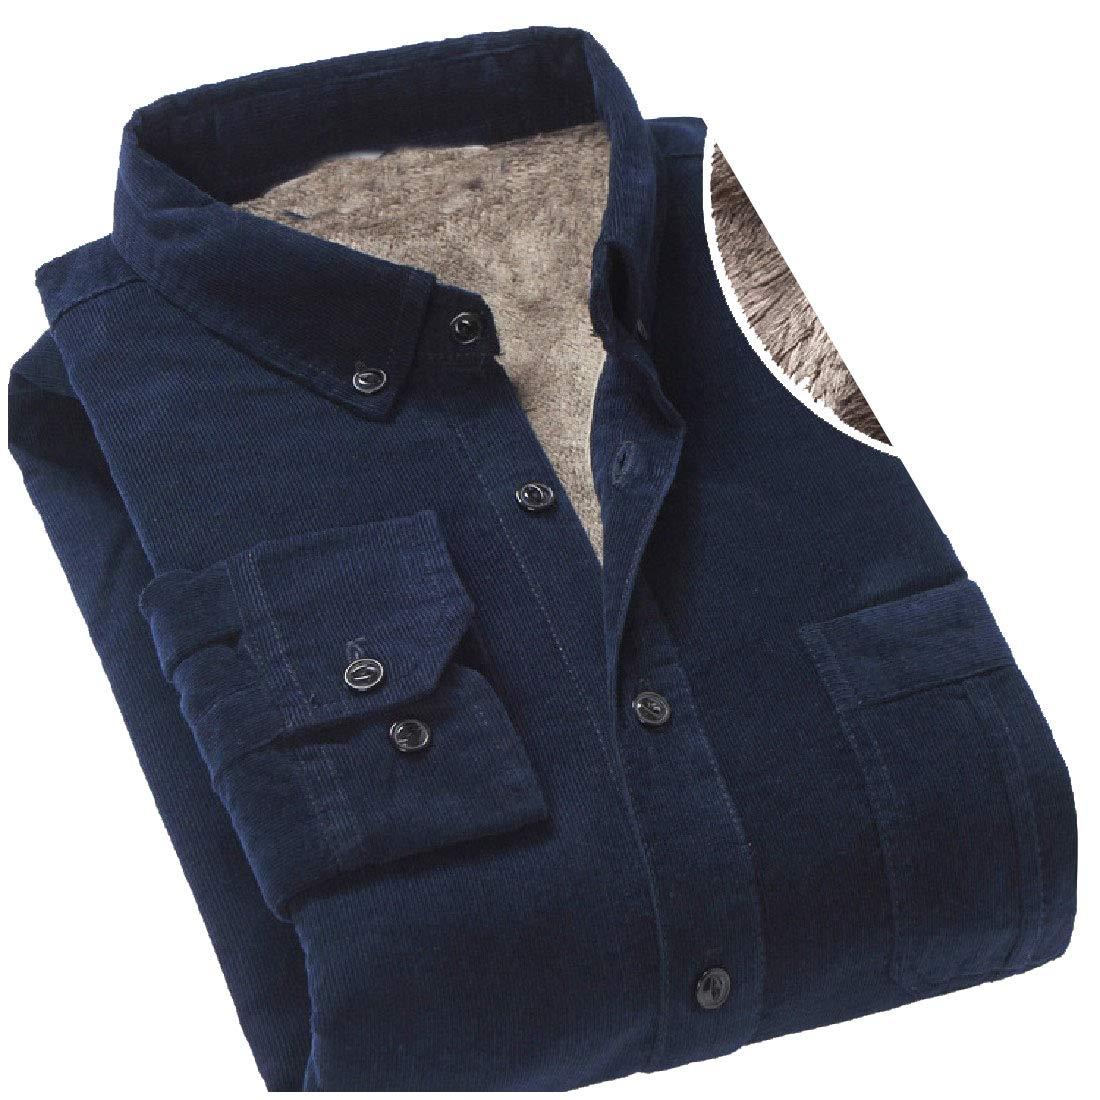 YUNY Mens Long-Sleeve Corduroy Button Turn-Down Collar Winter Work Shirt AS1 S